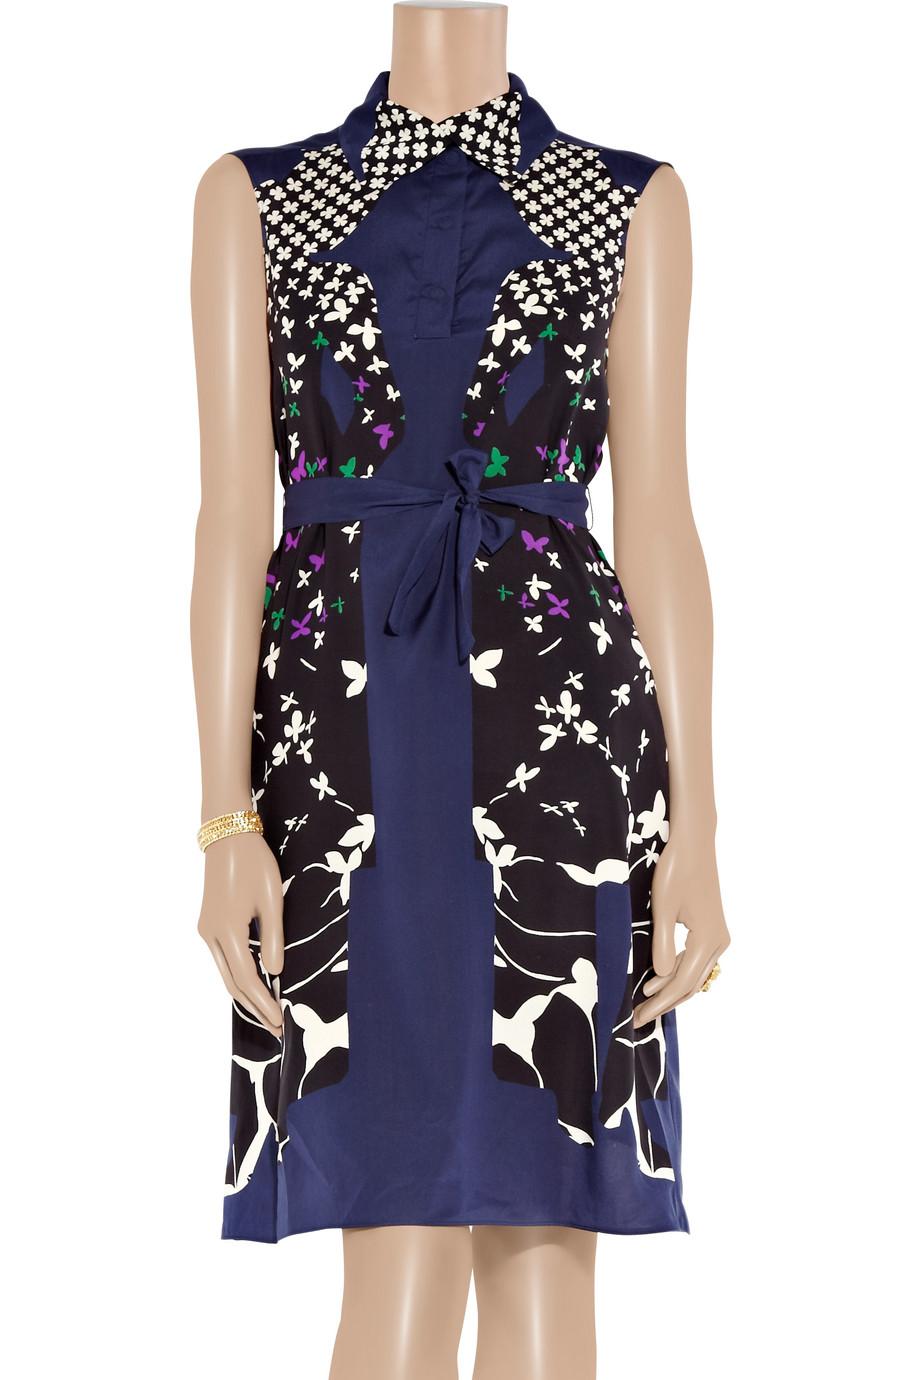 Saint Laurent Printed Silk Crepe De Chine Dress In Blue